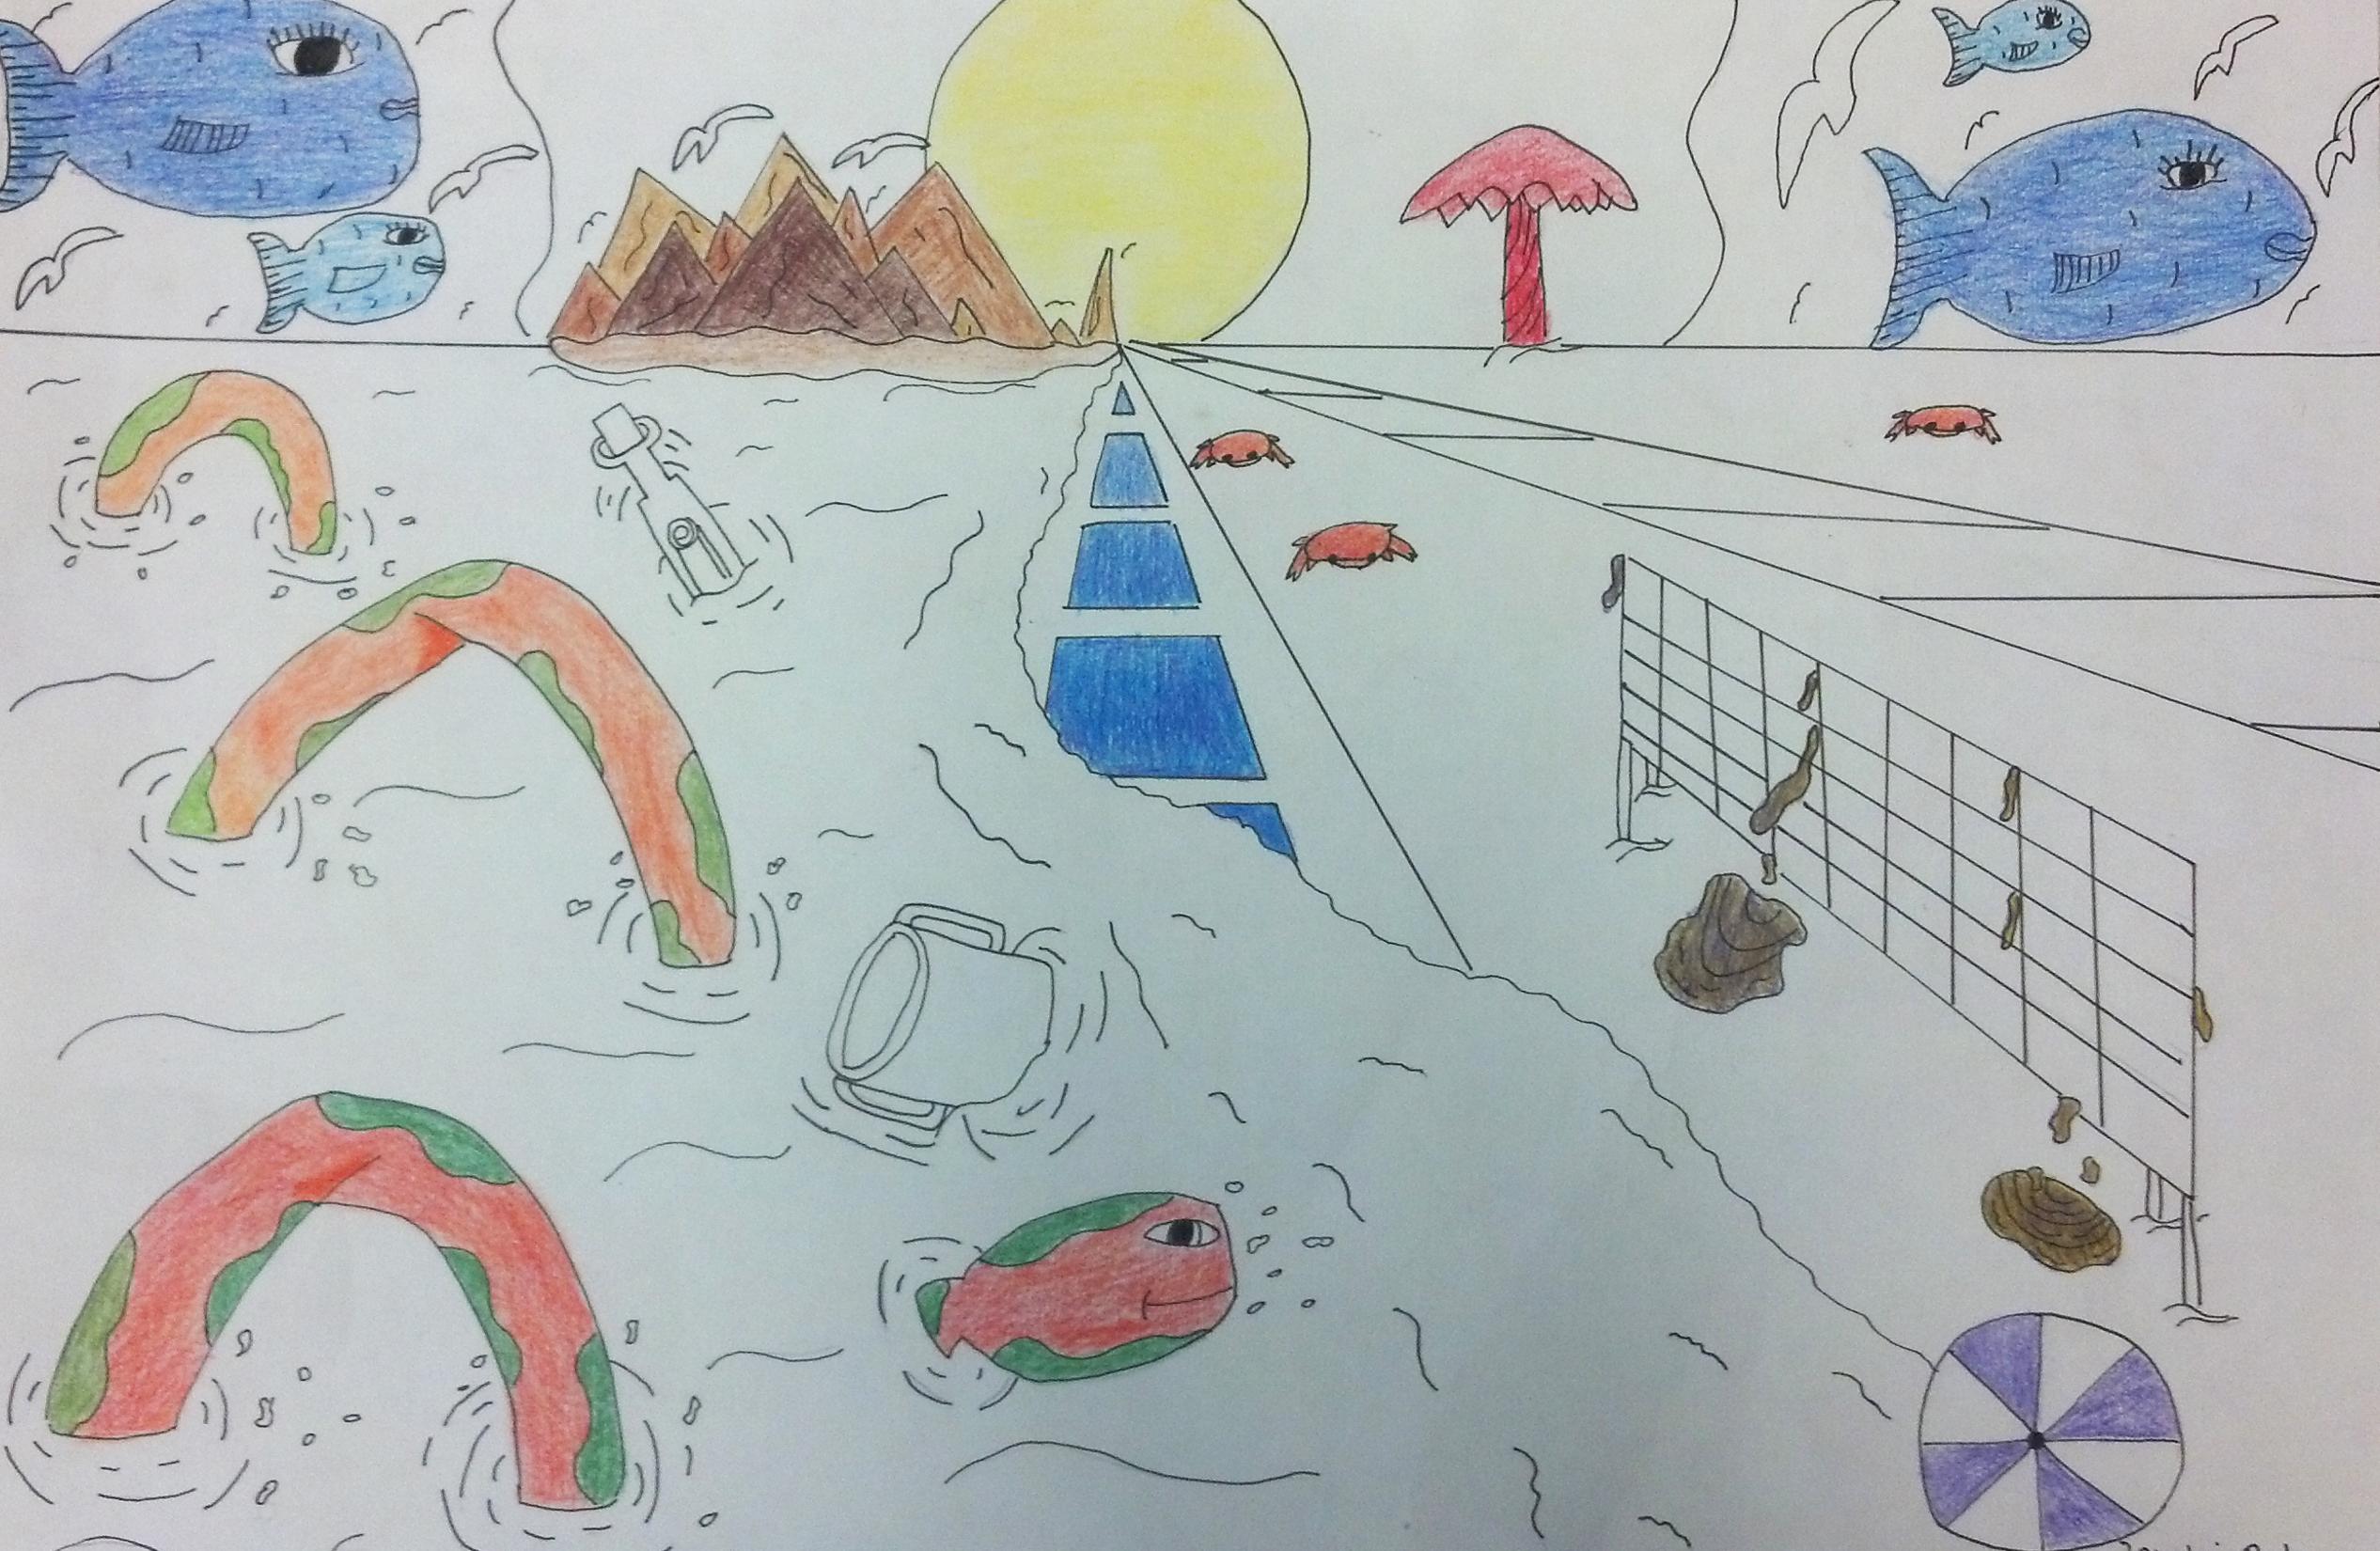 The Smartteacher Resource Surrealistic Perspective Lesson